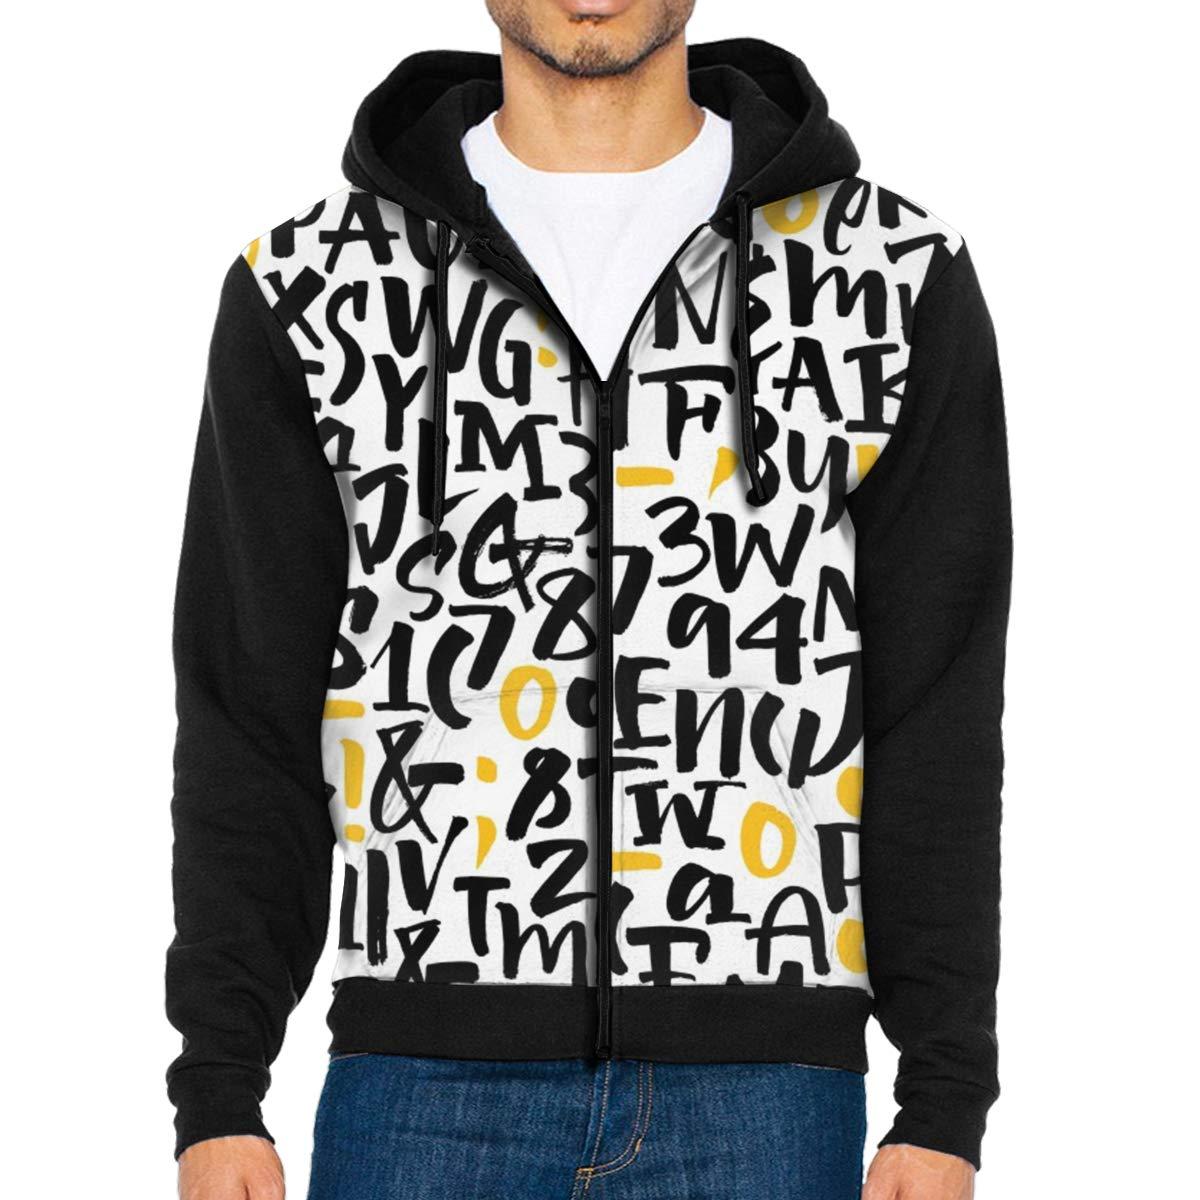 LFCLOSET Alphabet Letters Pattern Lightweight Mans Jacket with Hood Long Sleeved Zippered Outwear